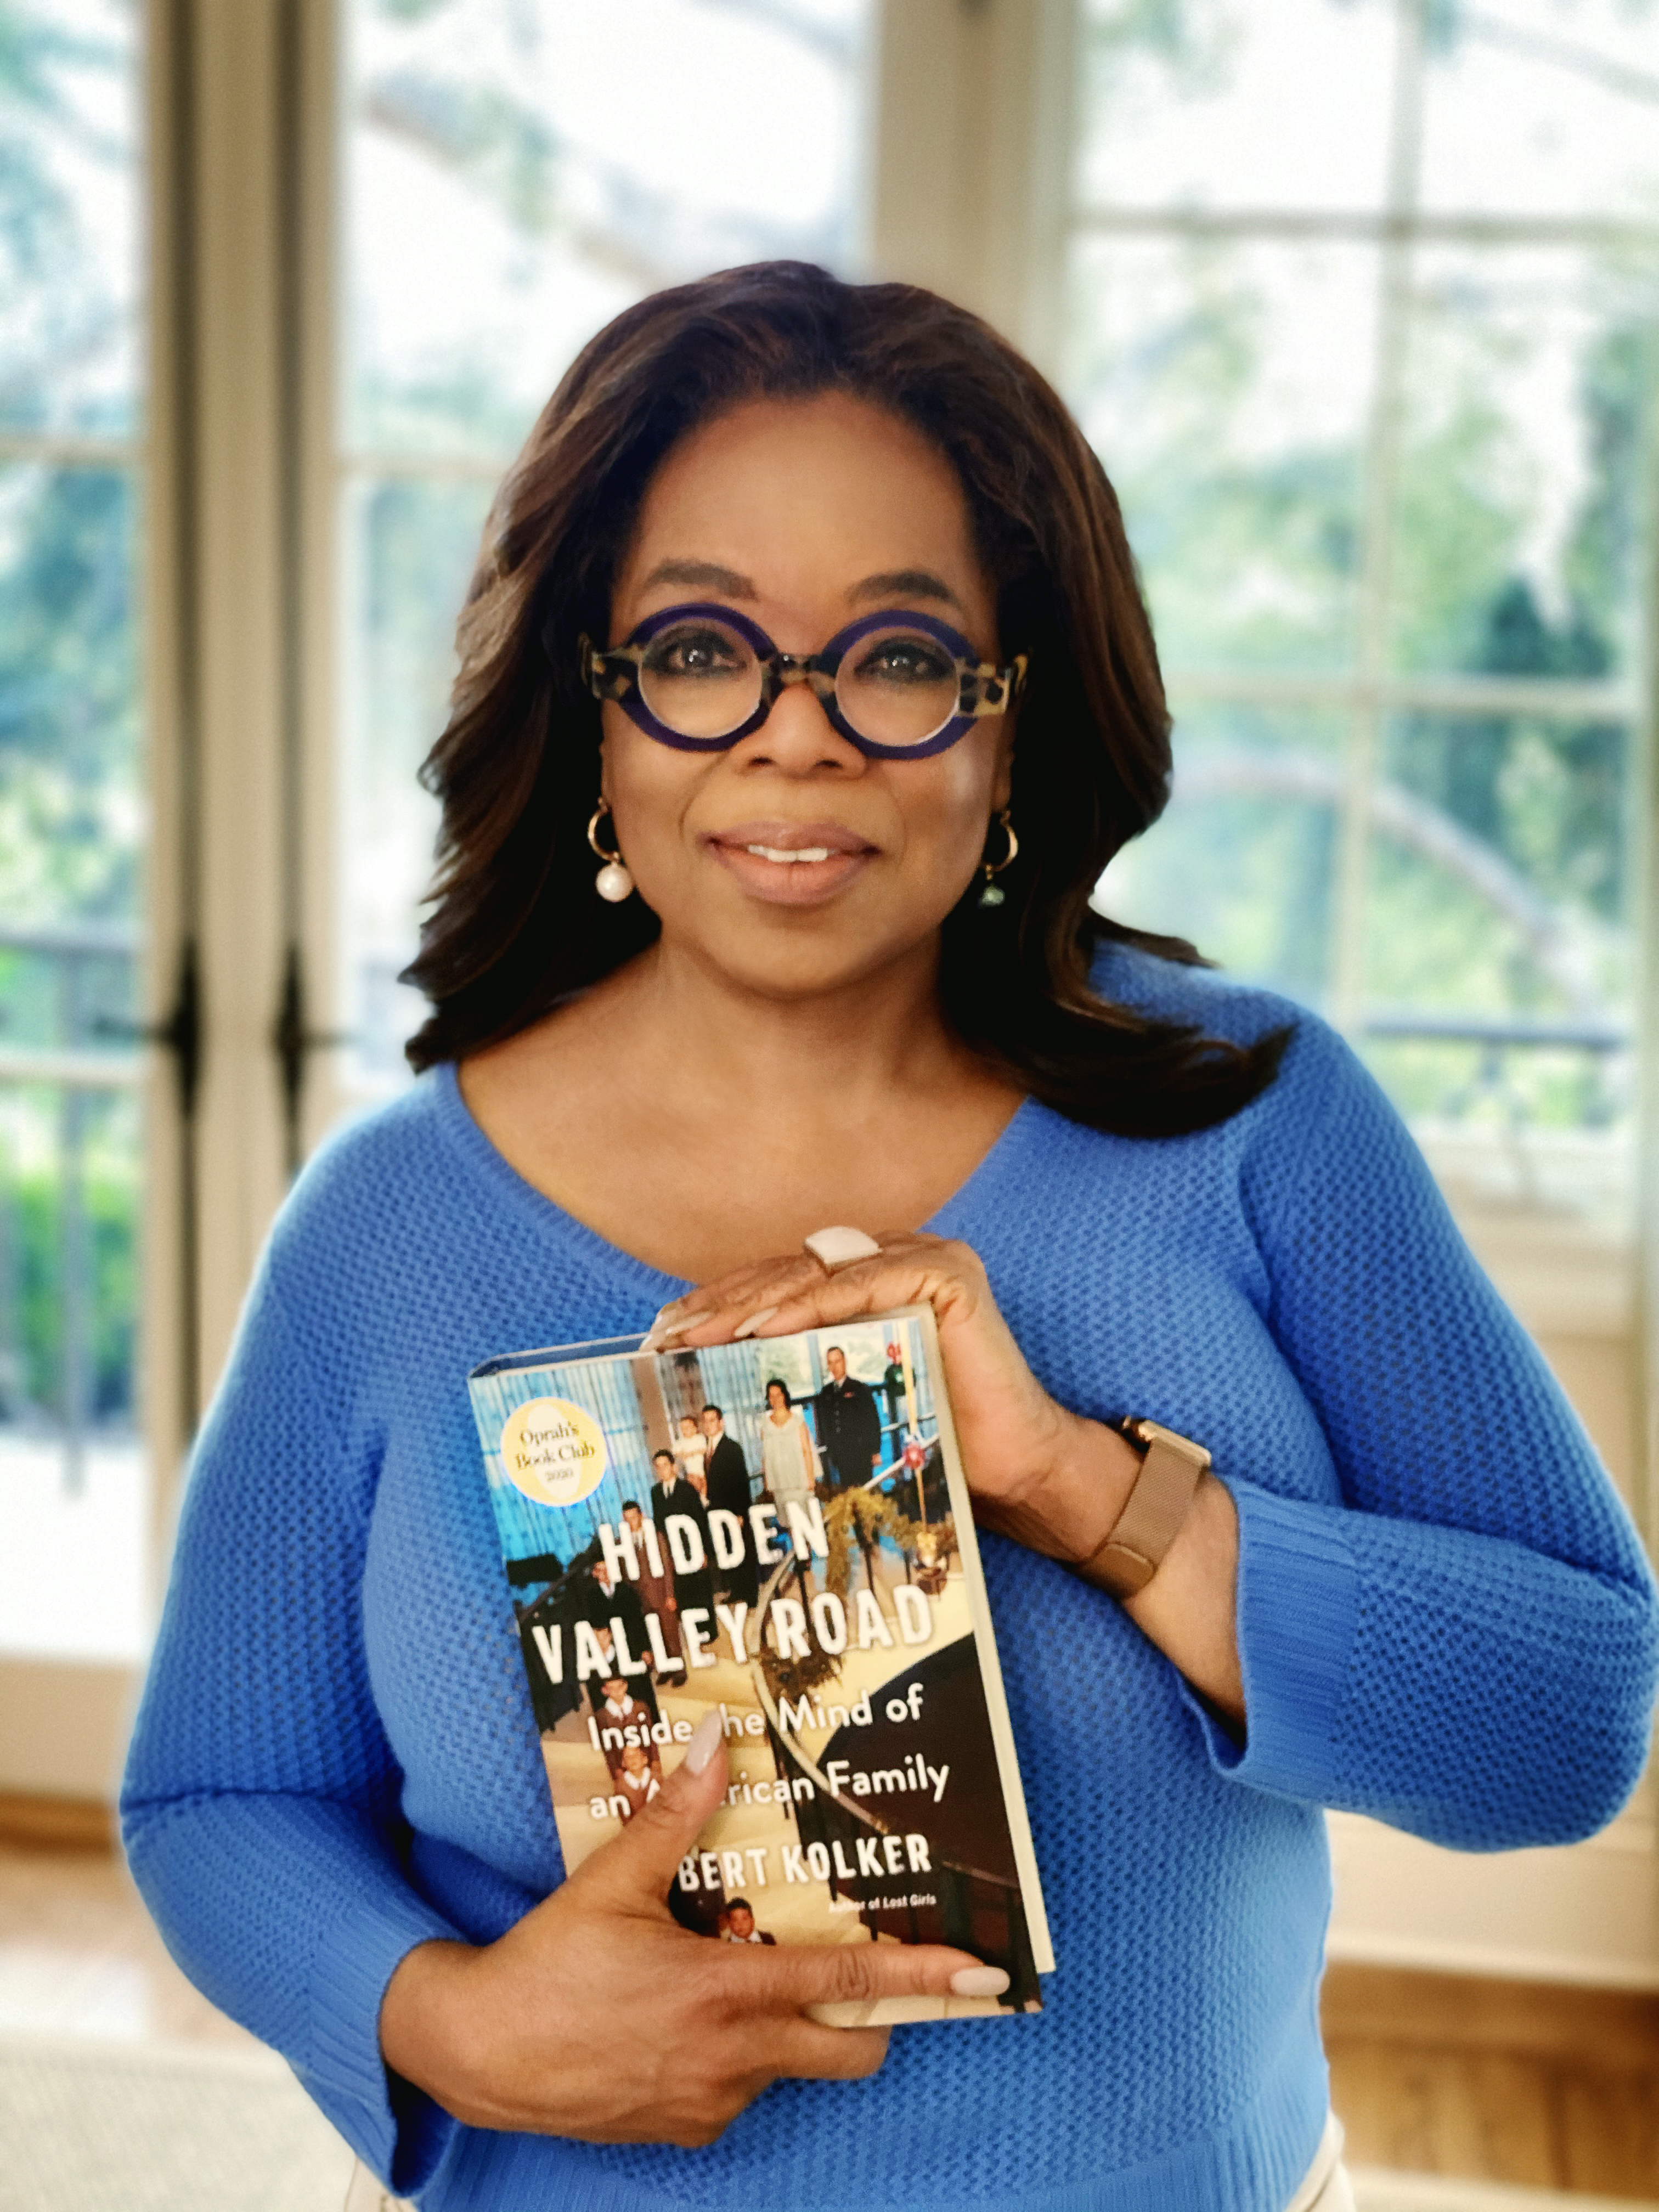 Oprah U0026 39 S Book Club Selects  U0026 39 Hidden Valley Road U0026 39